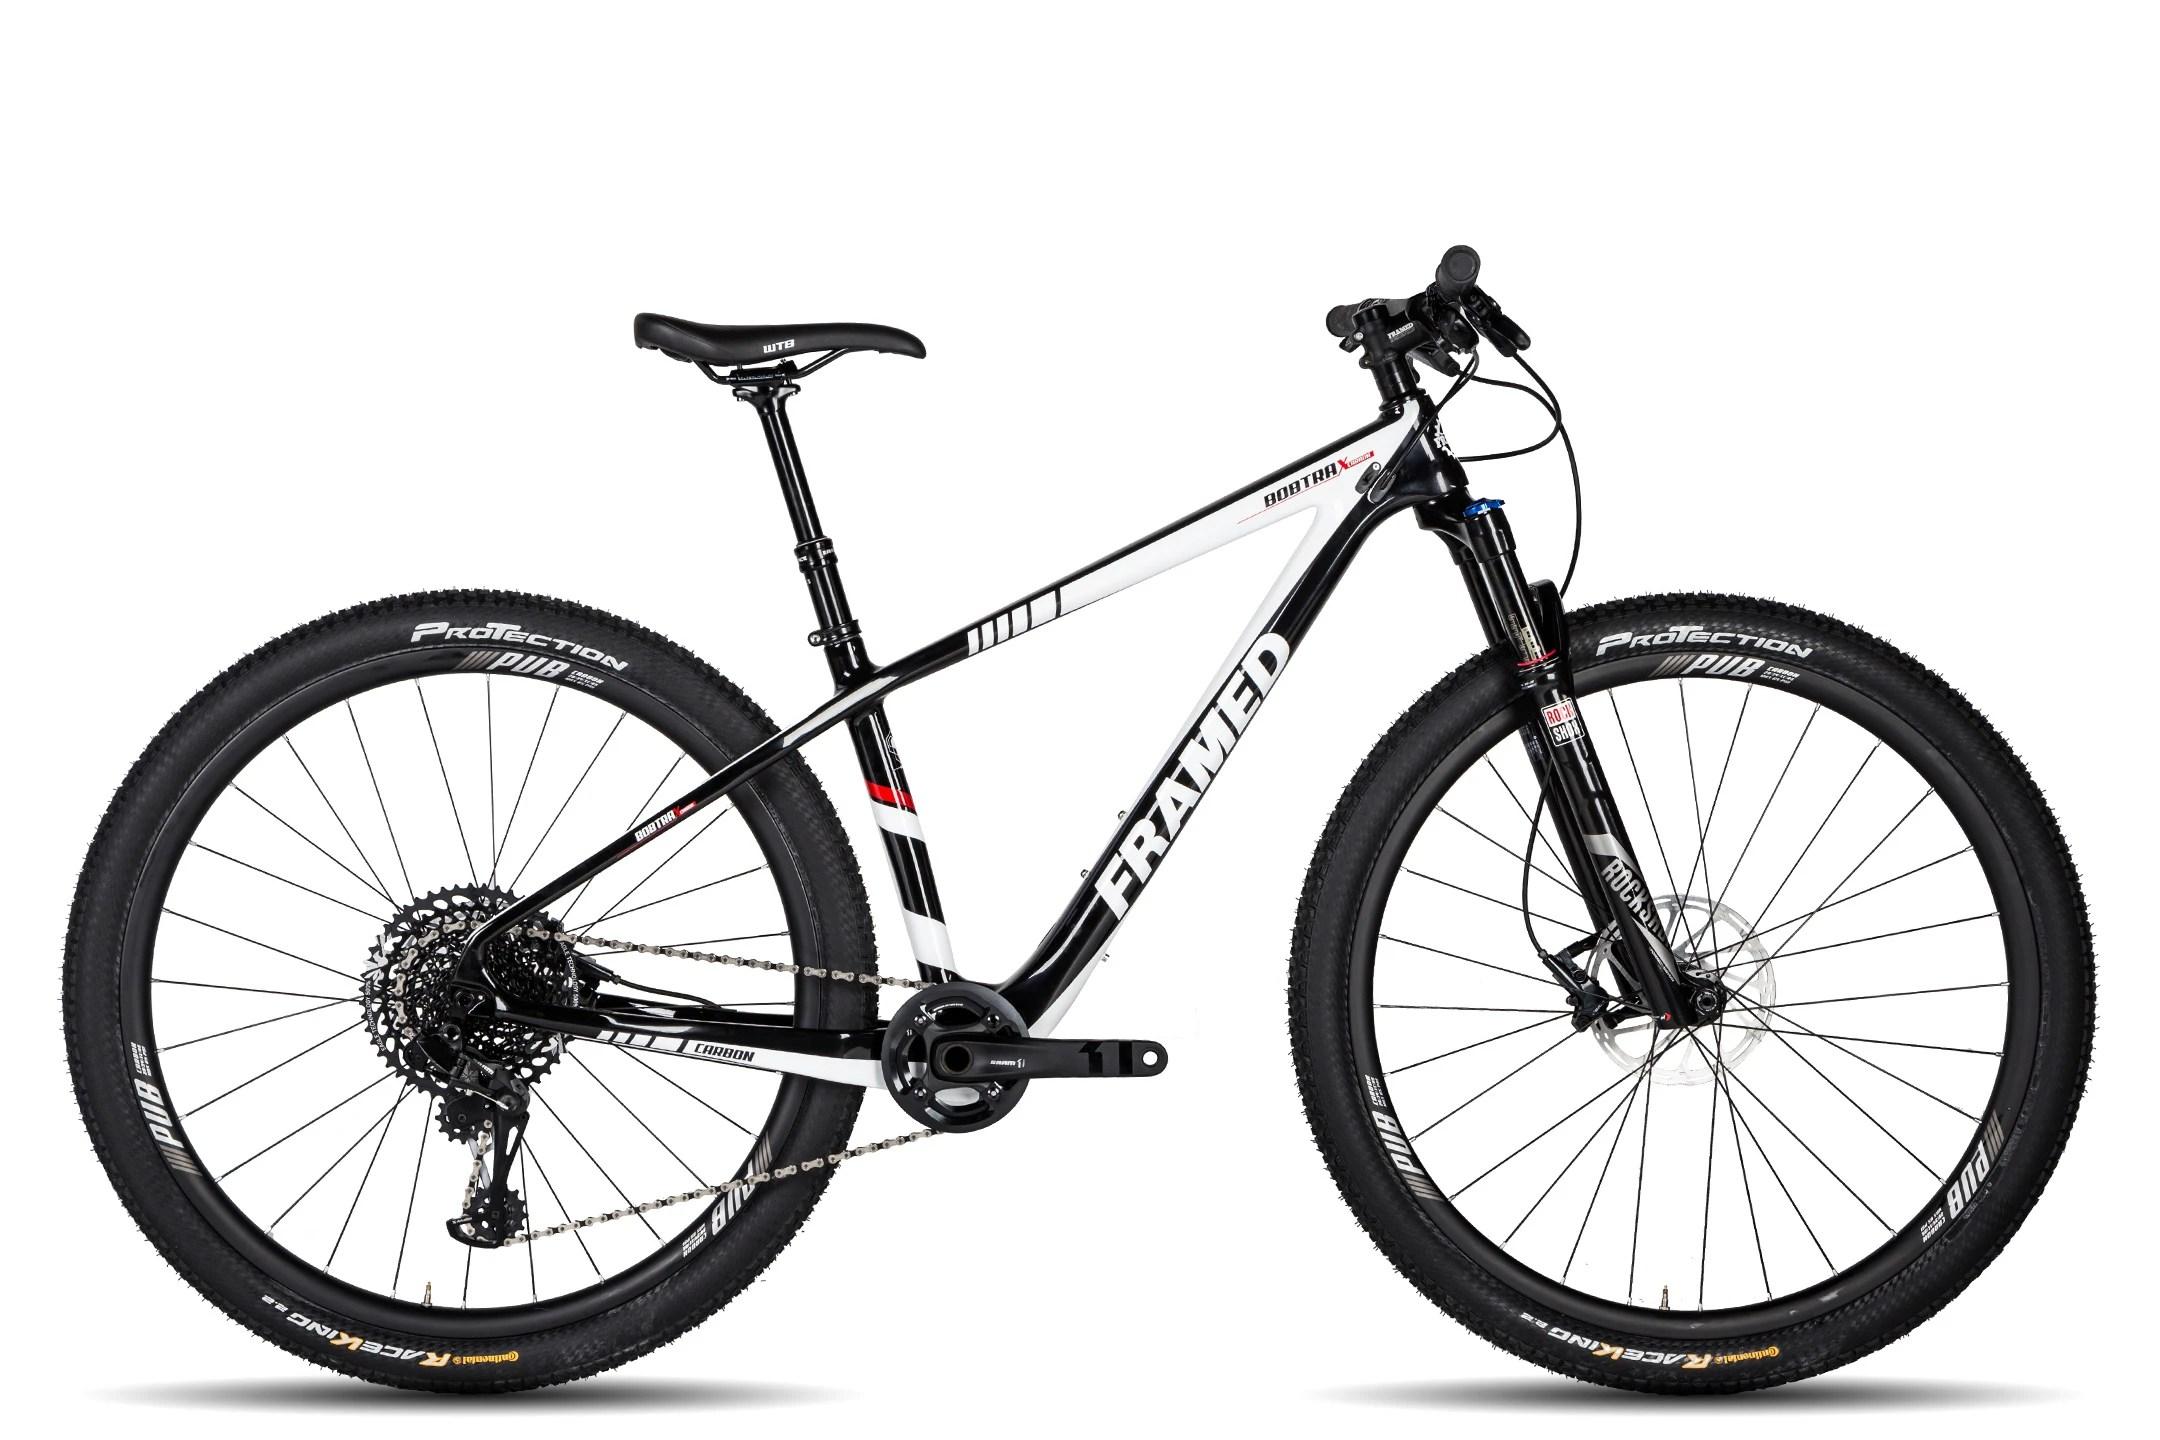 bw yamaha bikes